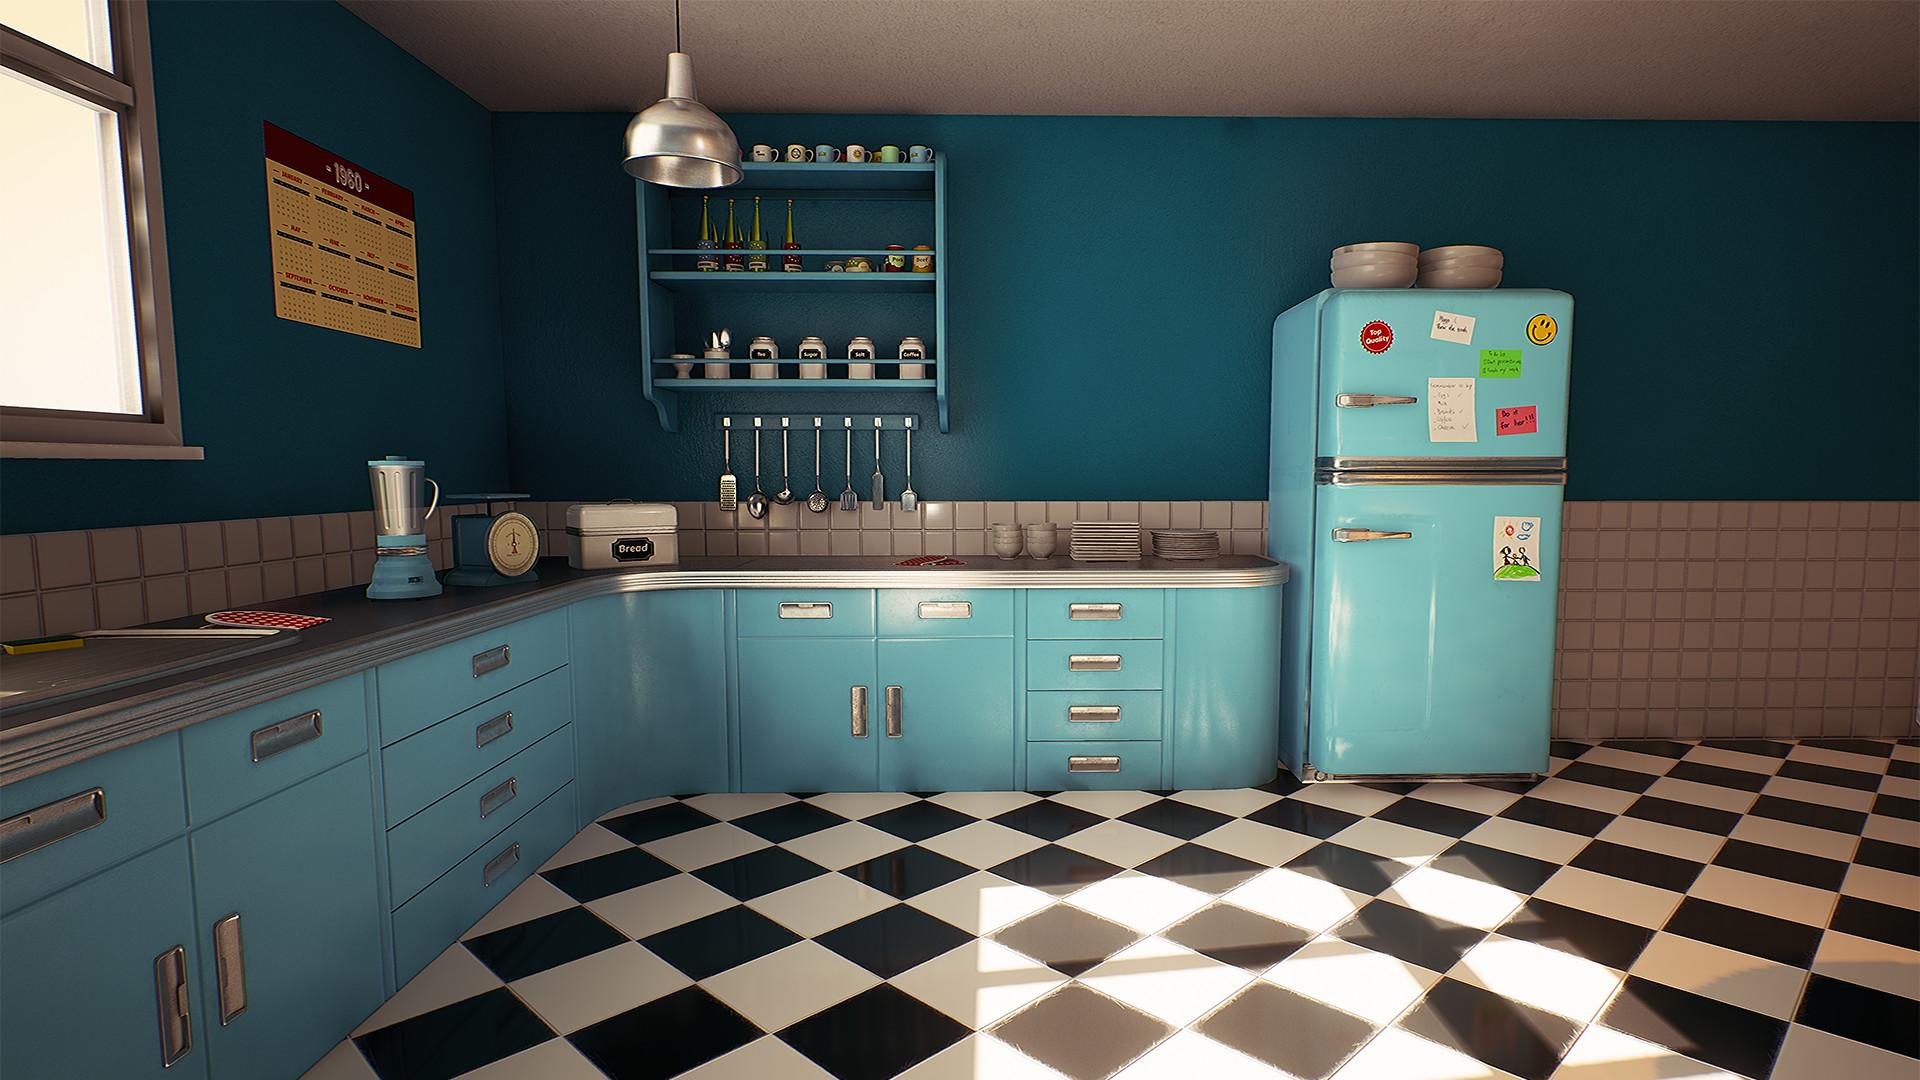 ArtStation - UE4 - Retro Kitchen, Nguyen Cong Thai